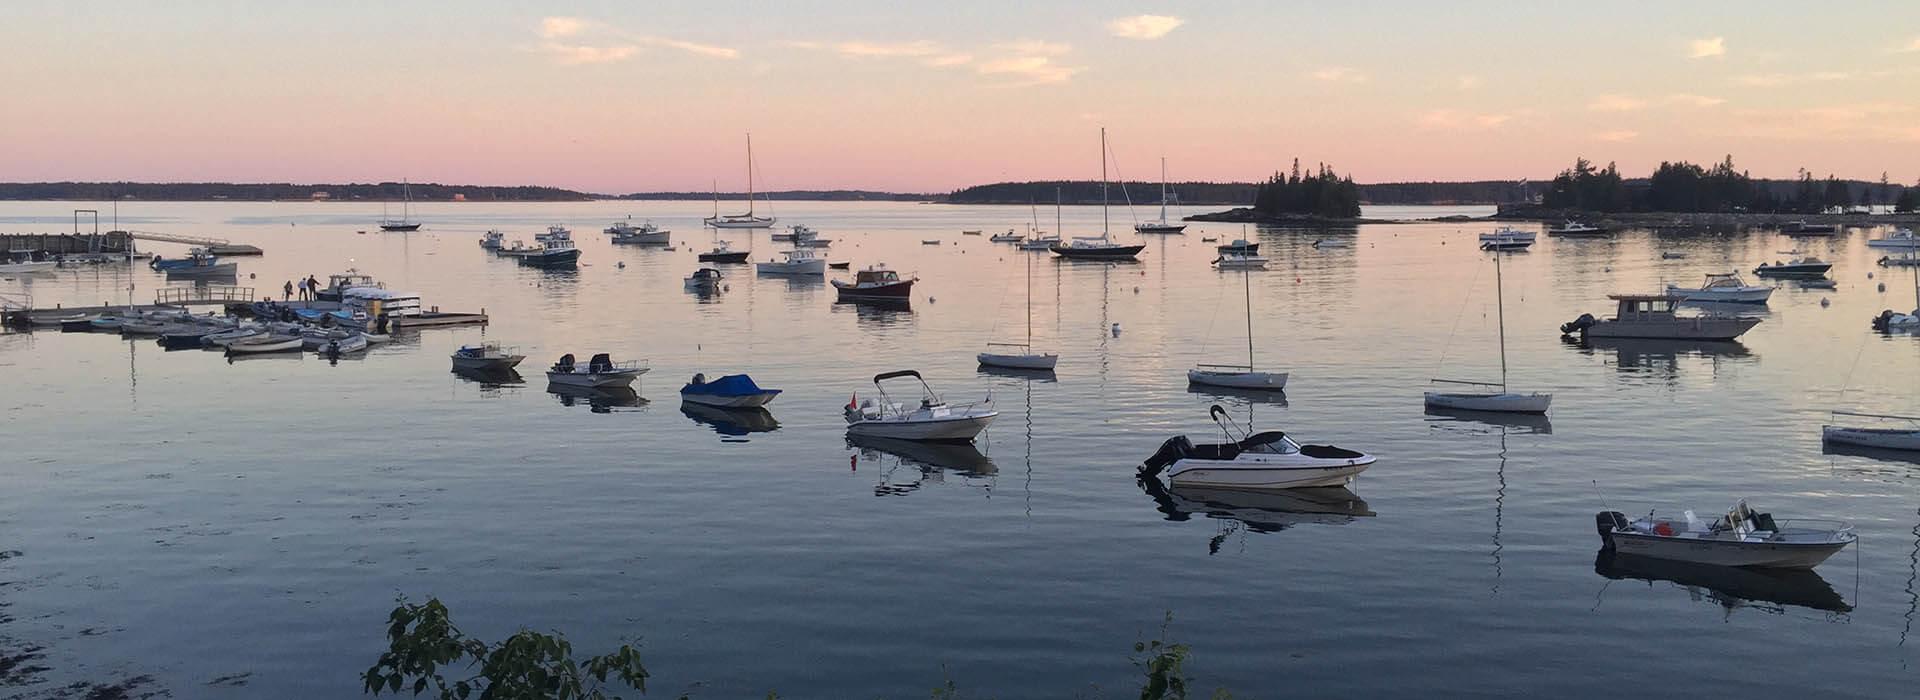 Boats in the harbor at dusk, Bar Harbor, Maine